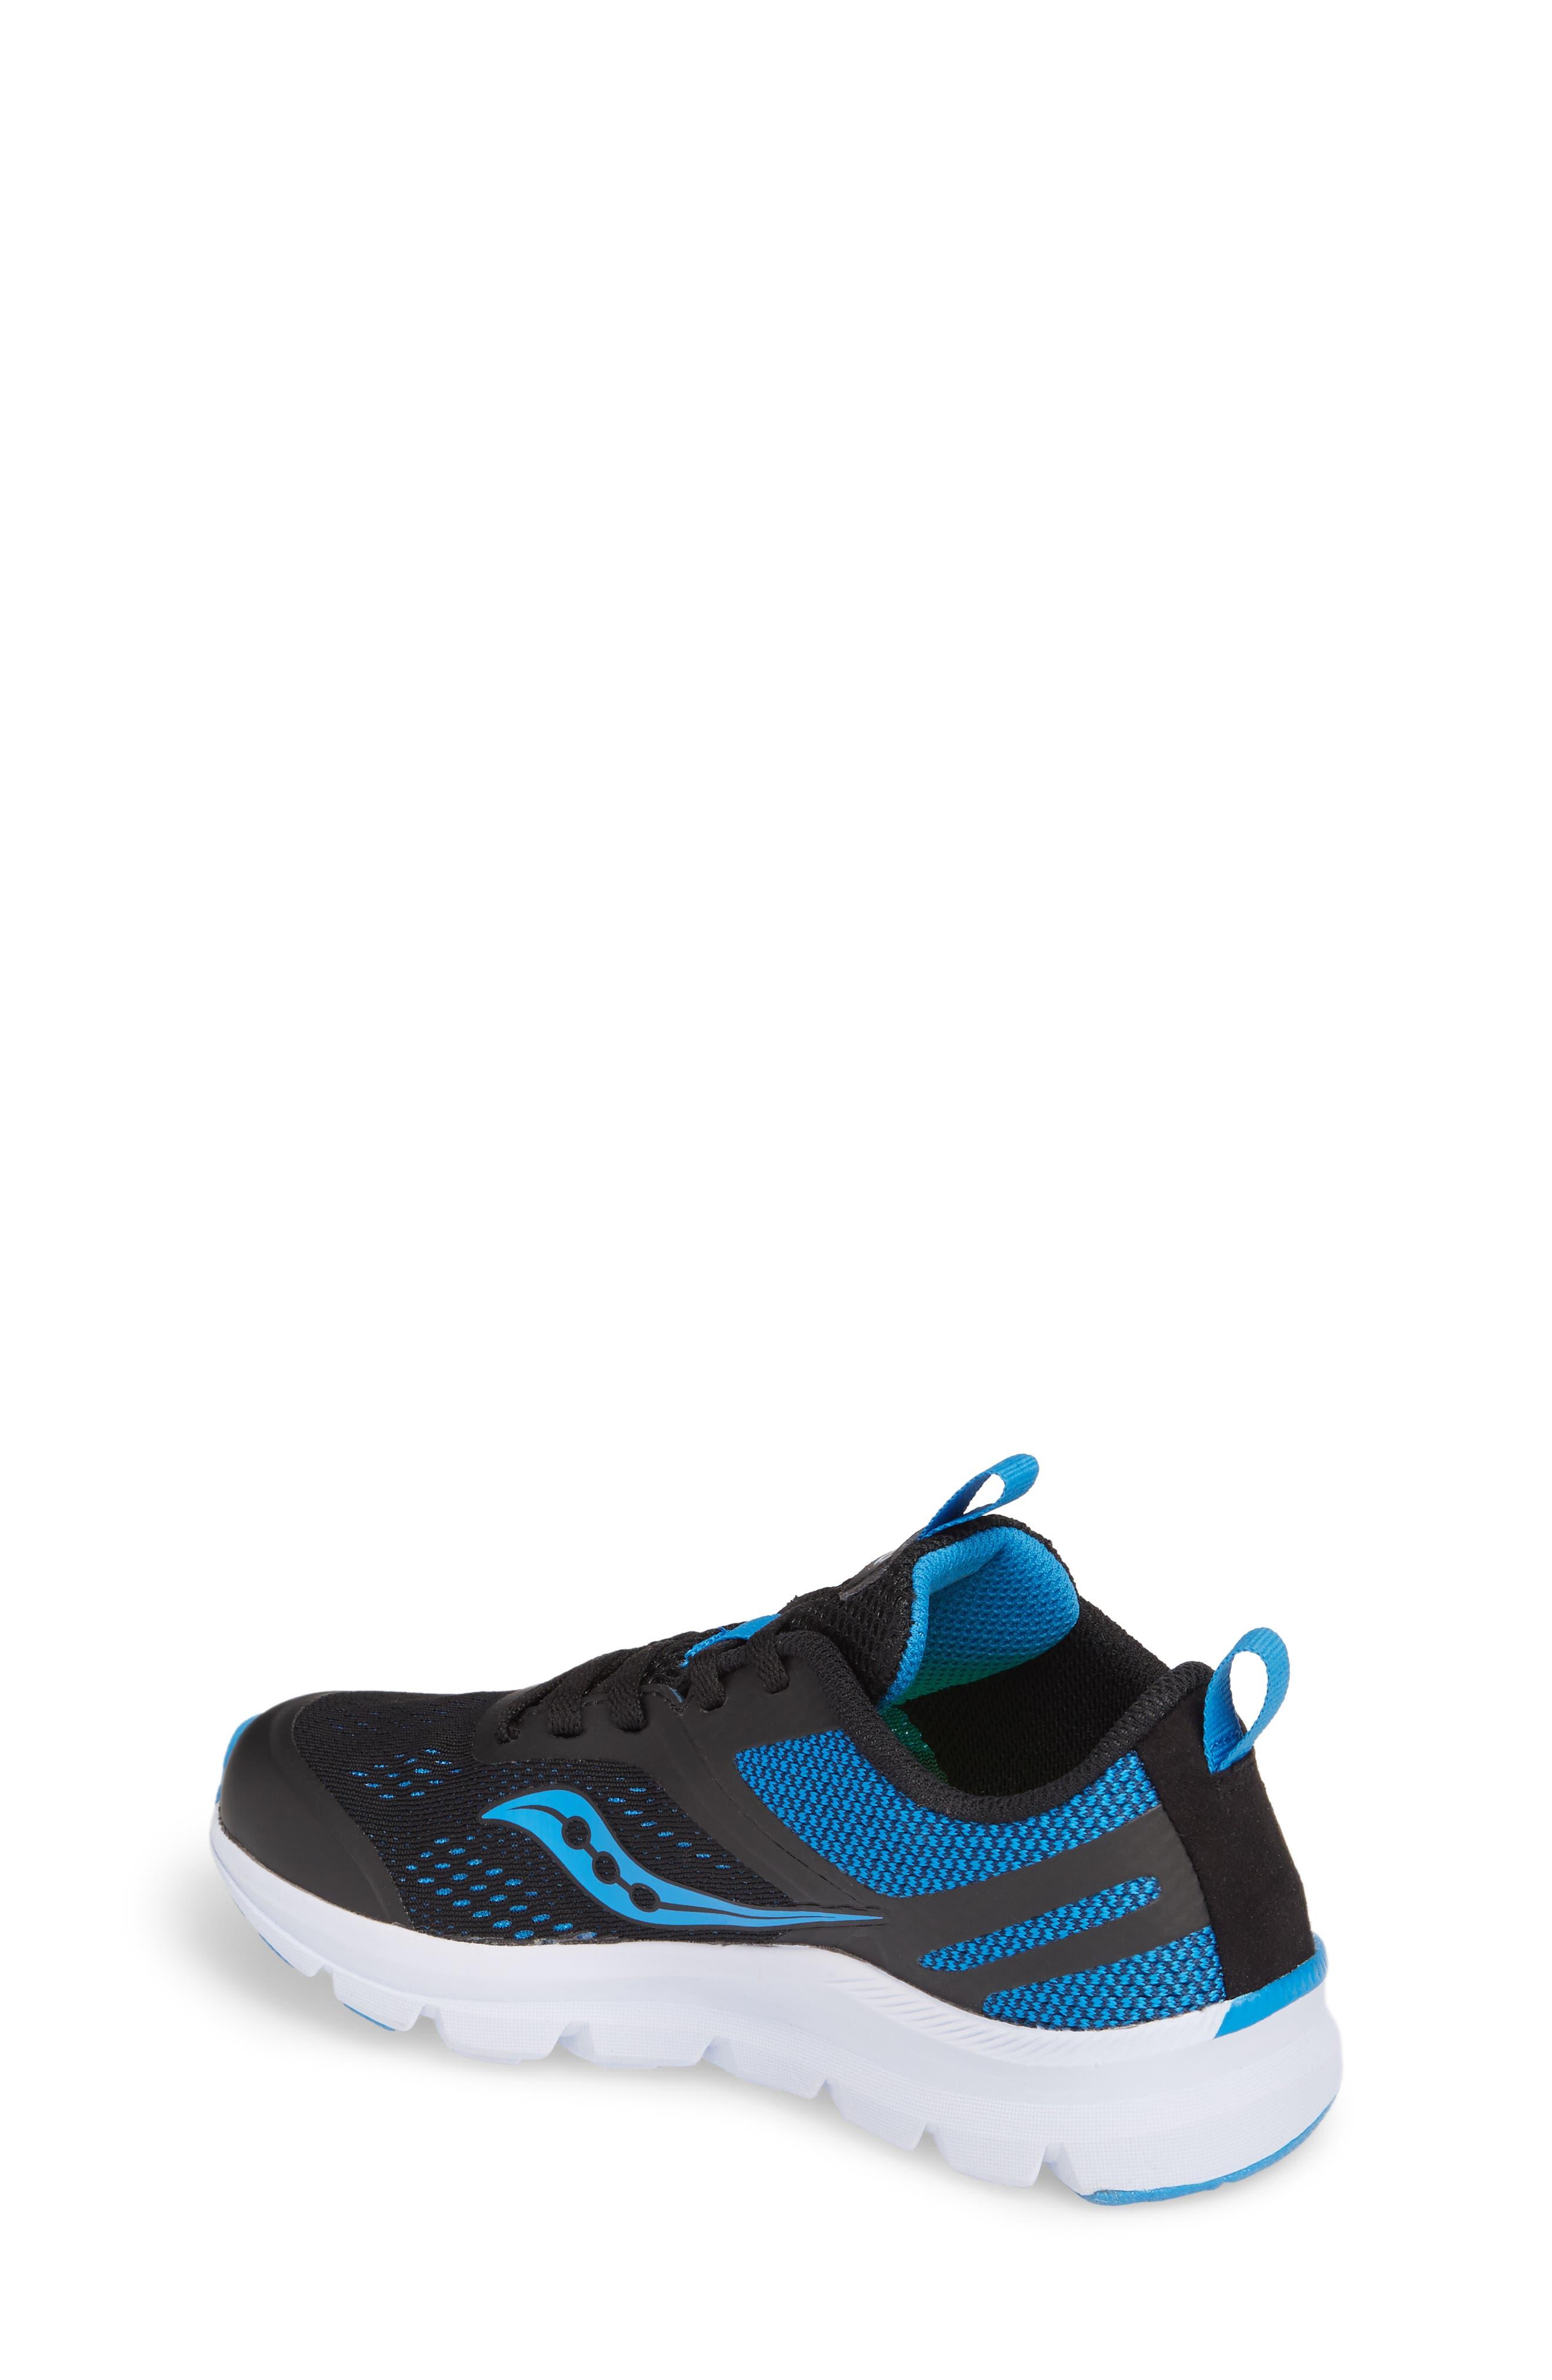 Liteform Miles Sneaker,                             Alternate thumbnail 2, color,                             001